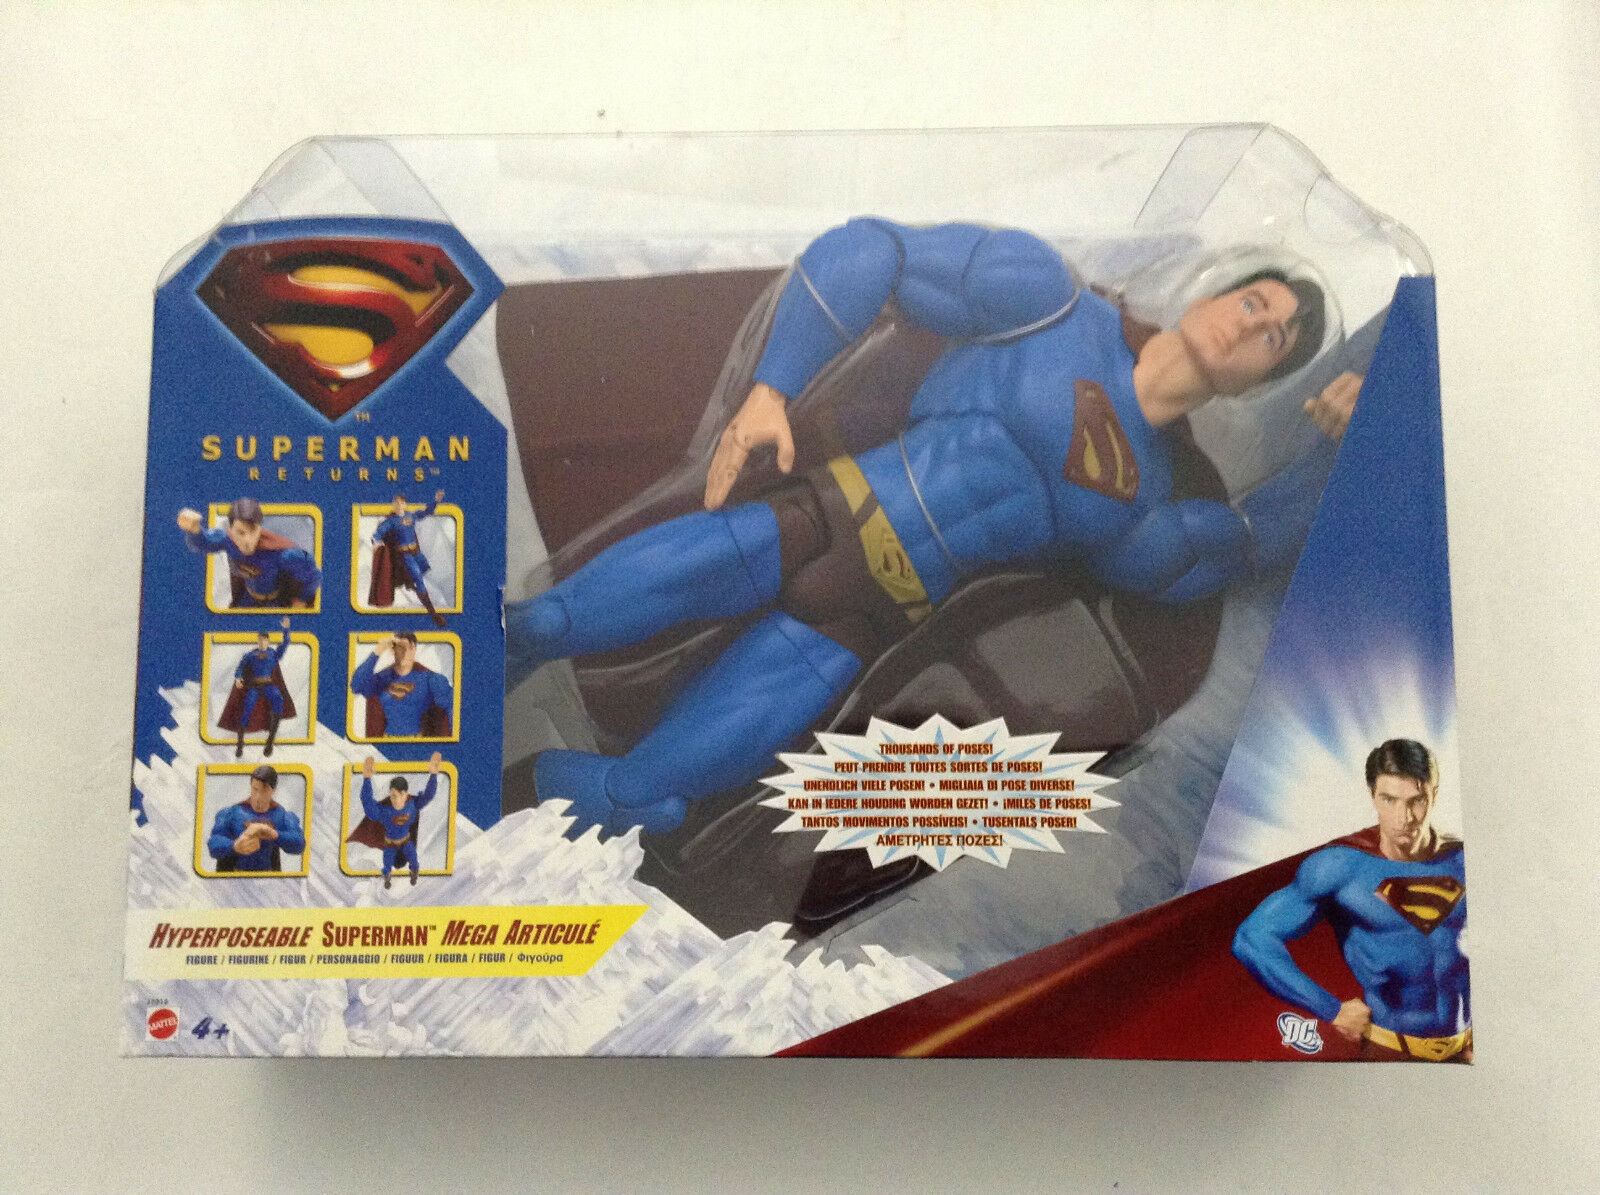 Superman Returns hyperposeable Superman 14  Figura Dc Mattel Nuevo (Renacimiento 52 jla